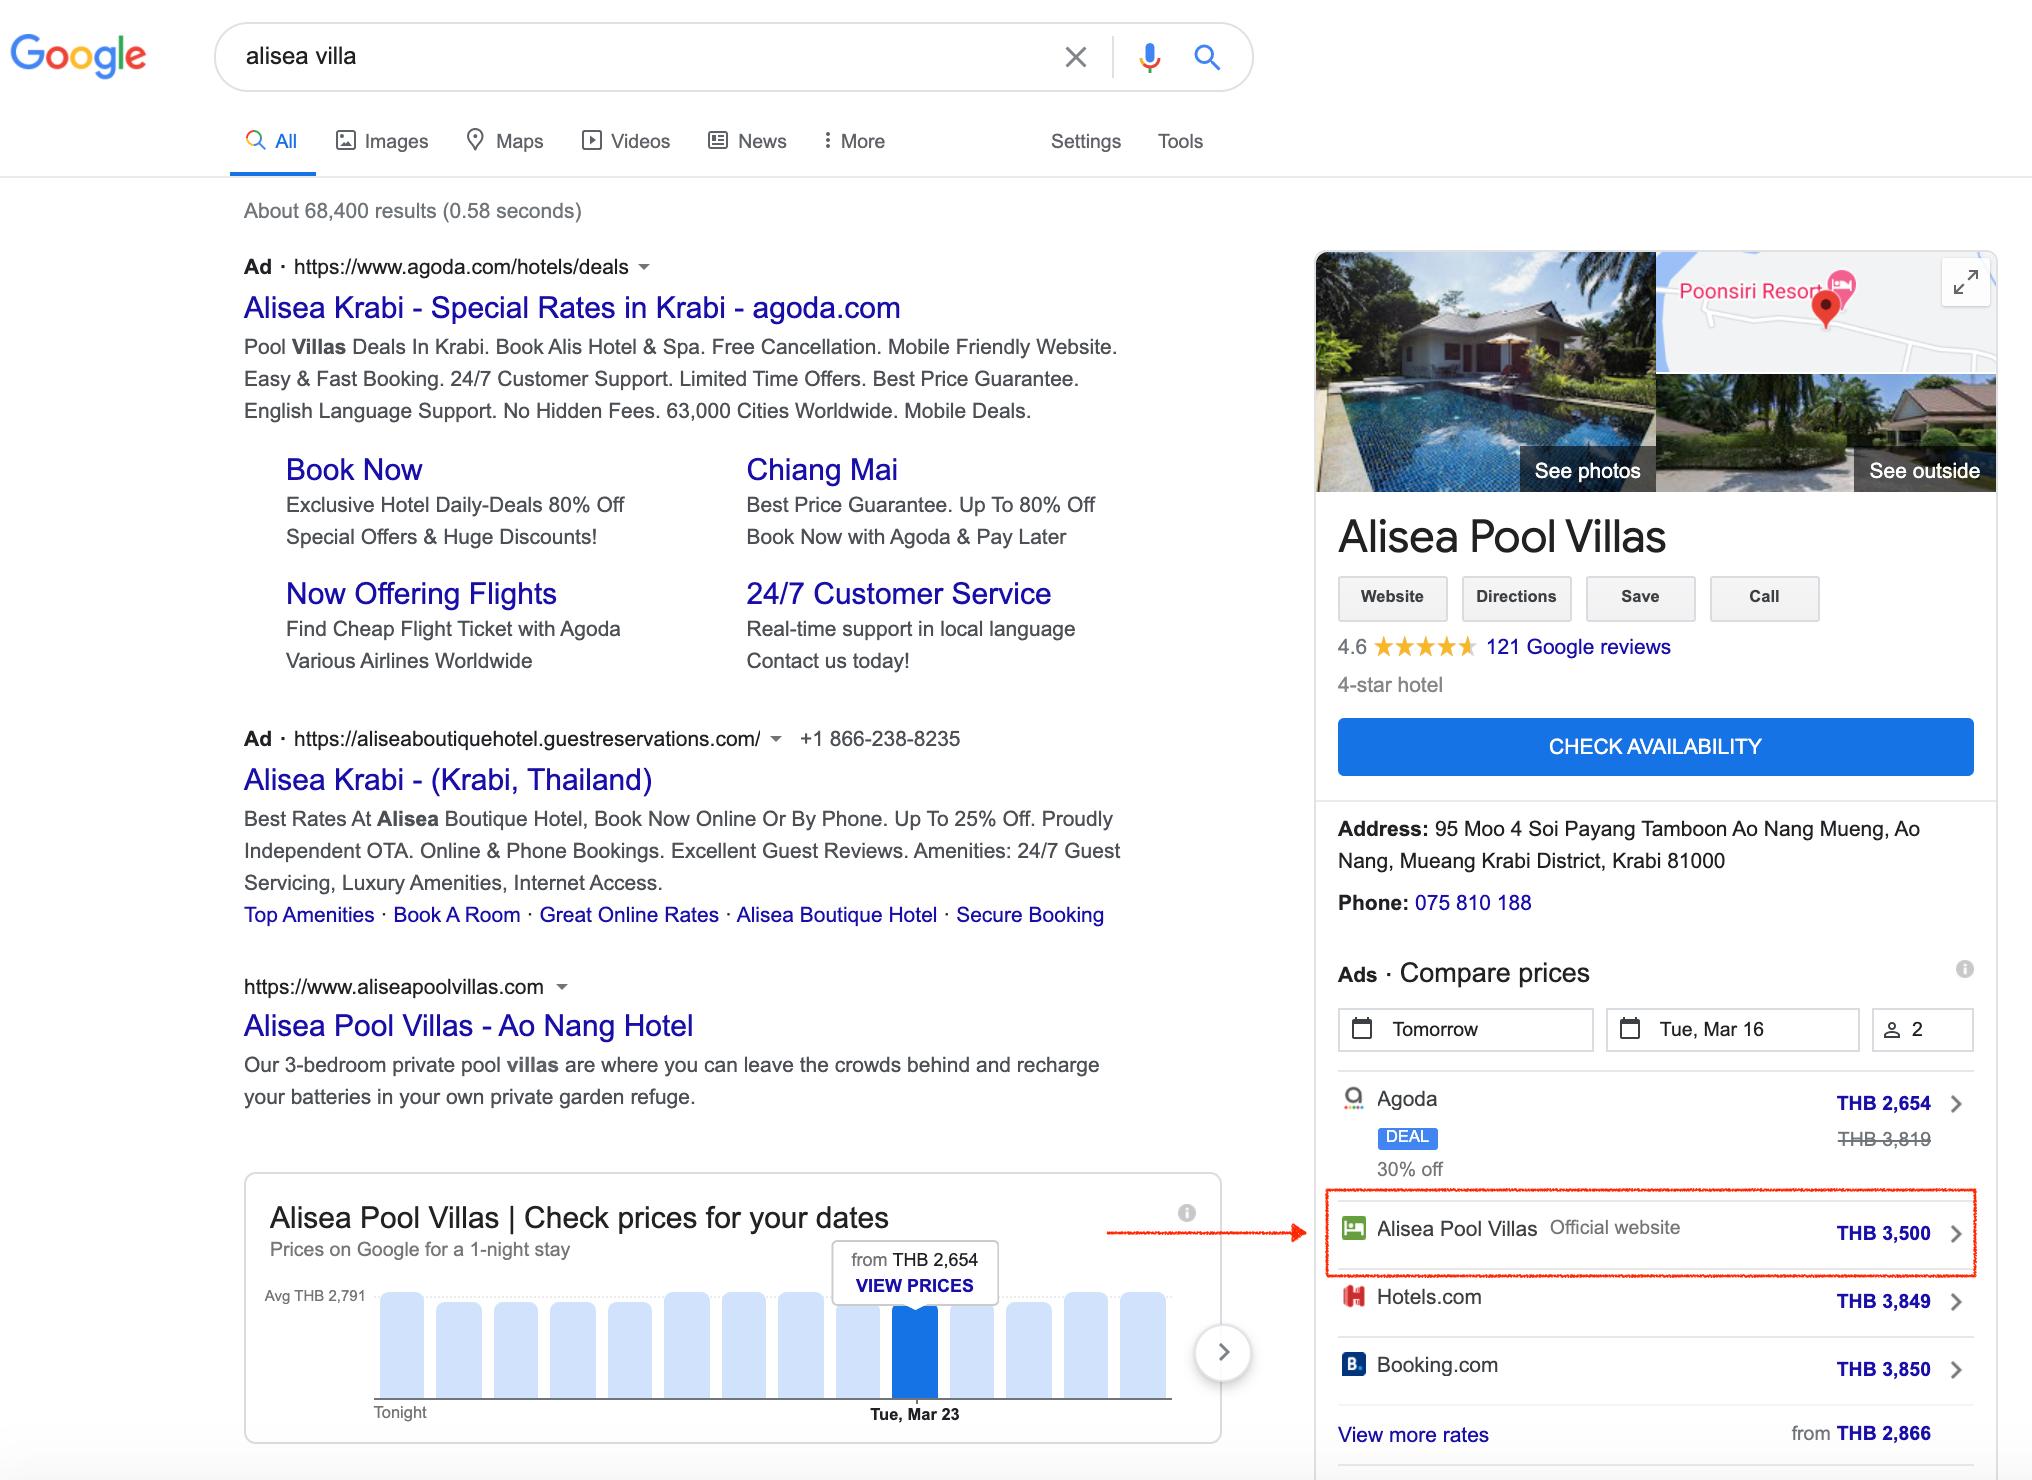 Google Price Adds